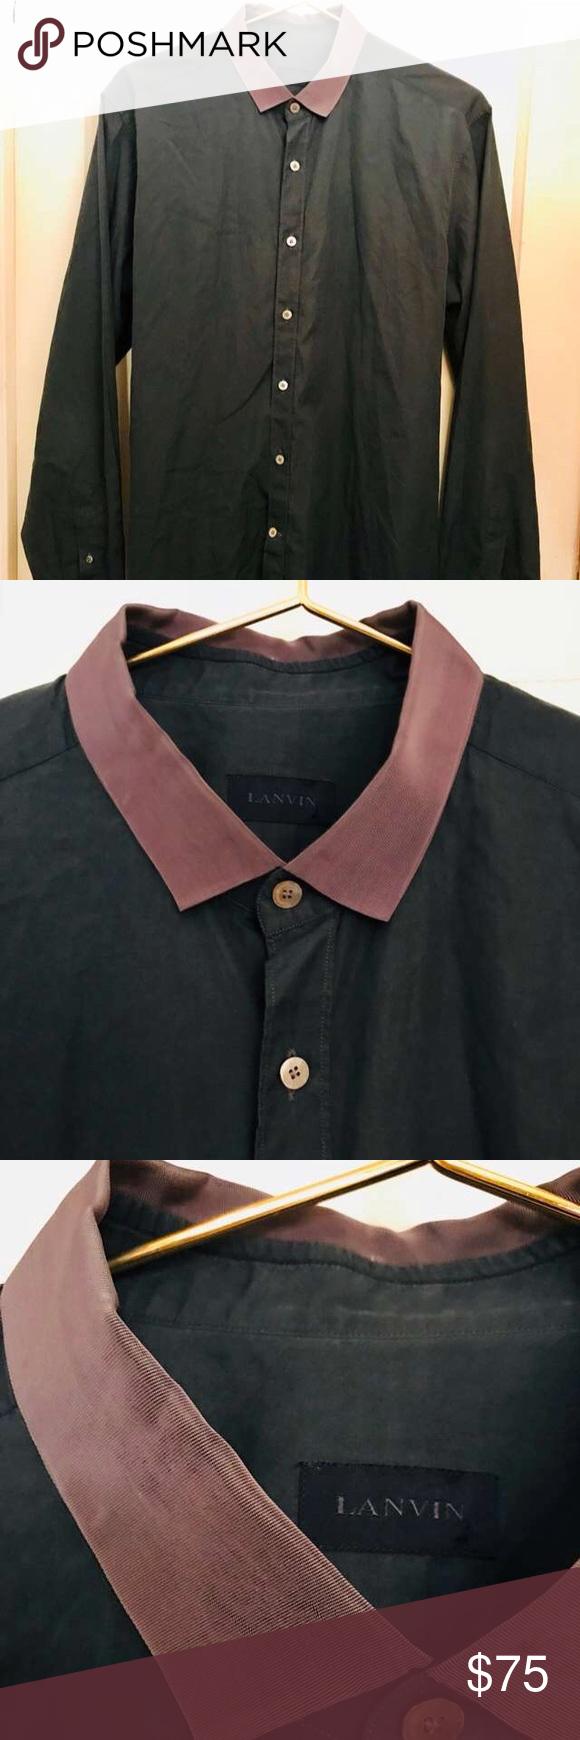 "Auth LANVIN gross grain collar cotton dress shirt Lanvin Dark green cotton poplin shirt, with warm grey ribbon collar. Clean w no stains pulls or damage. Orig $550 Shoulders 19"" , Chest 24"", Sleeve 26.5"", Length 33"" Lanvin Shirts Dress Shirts"